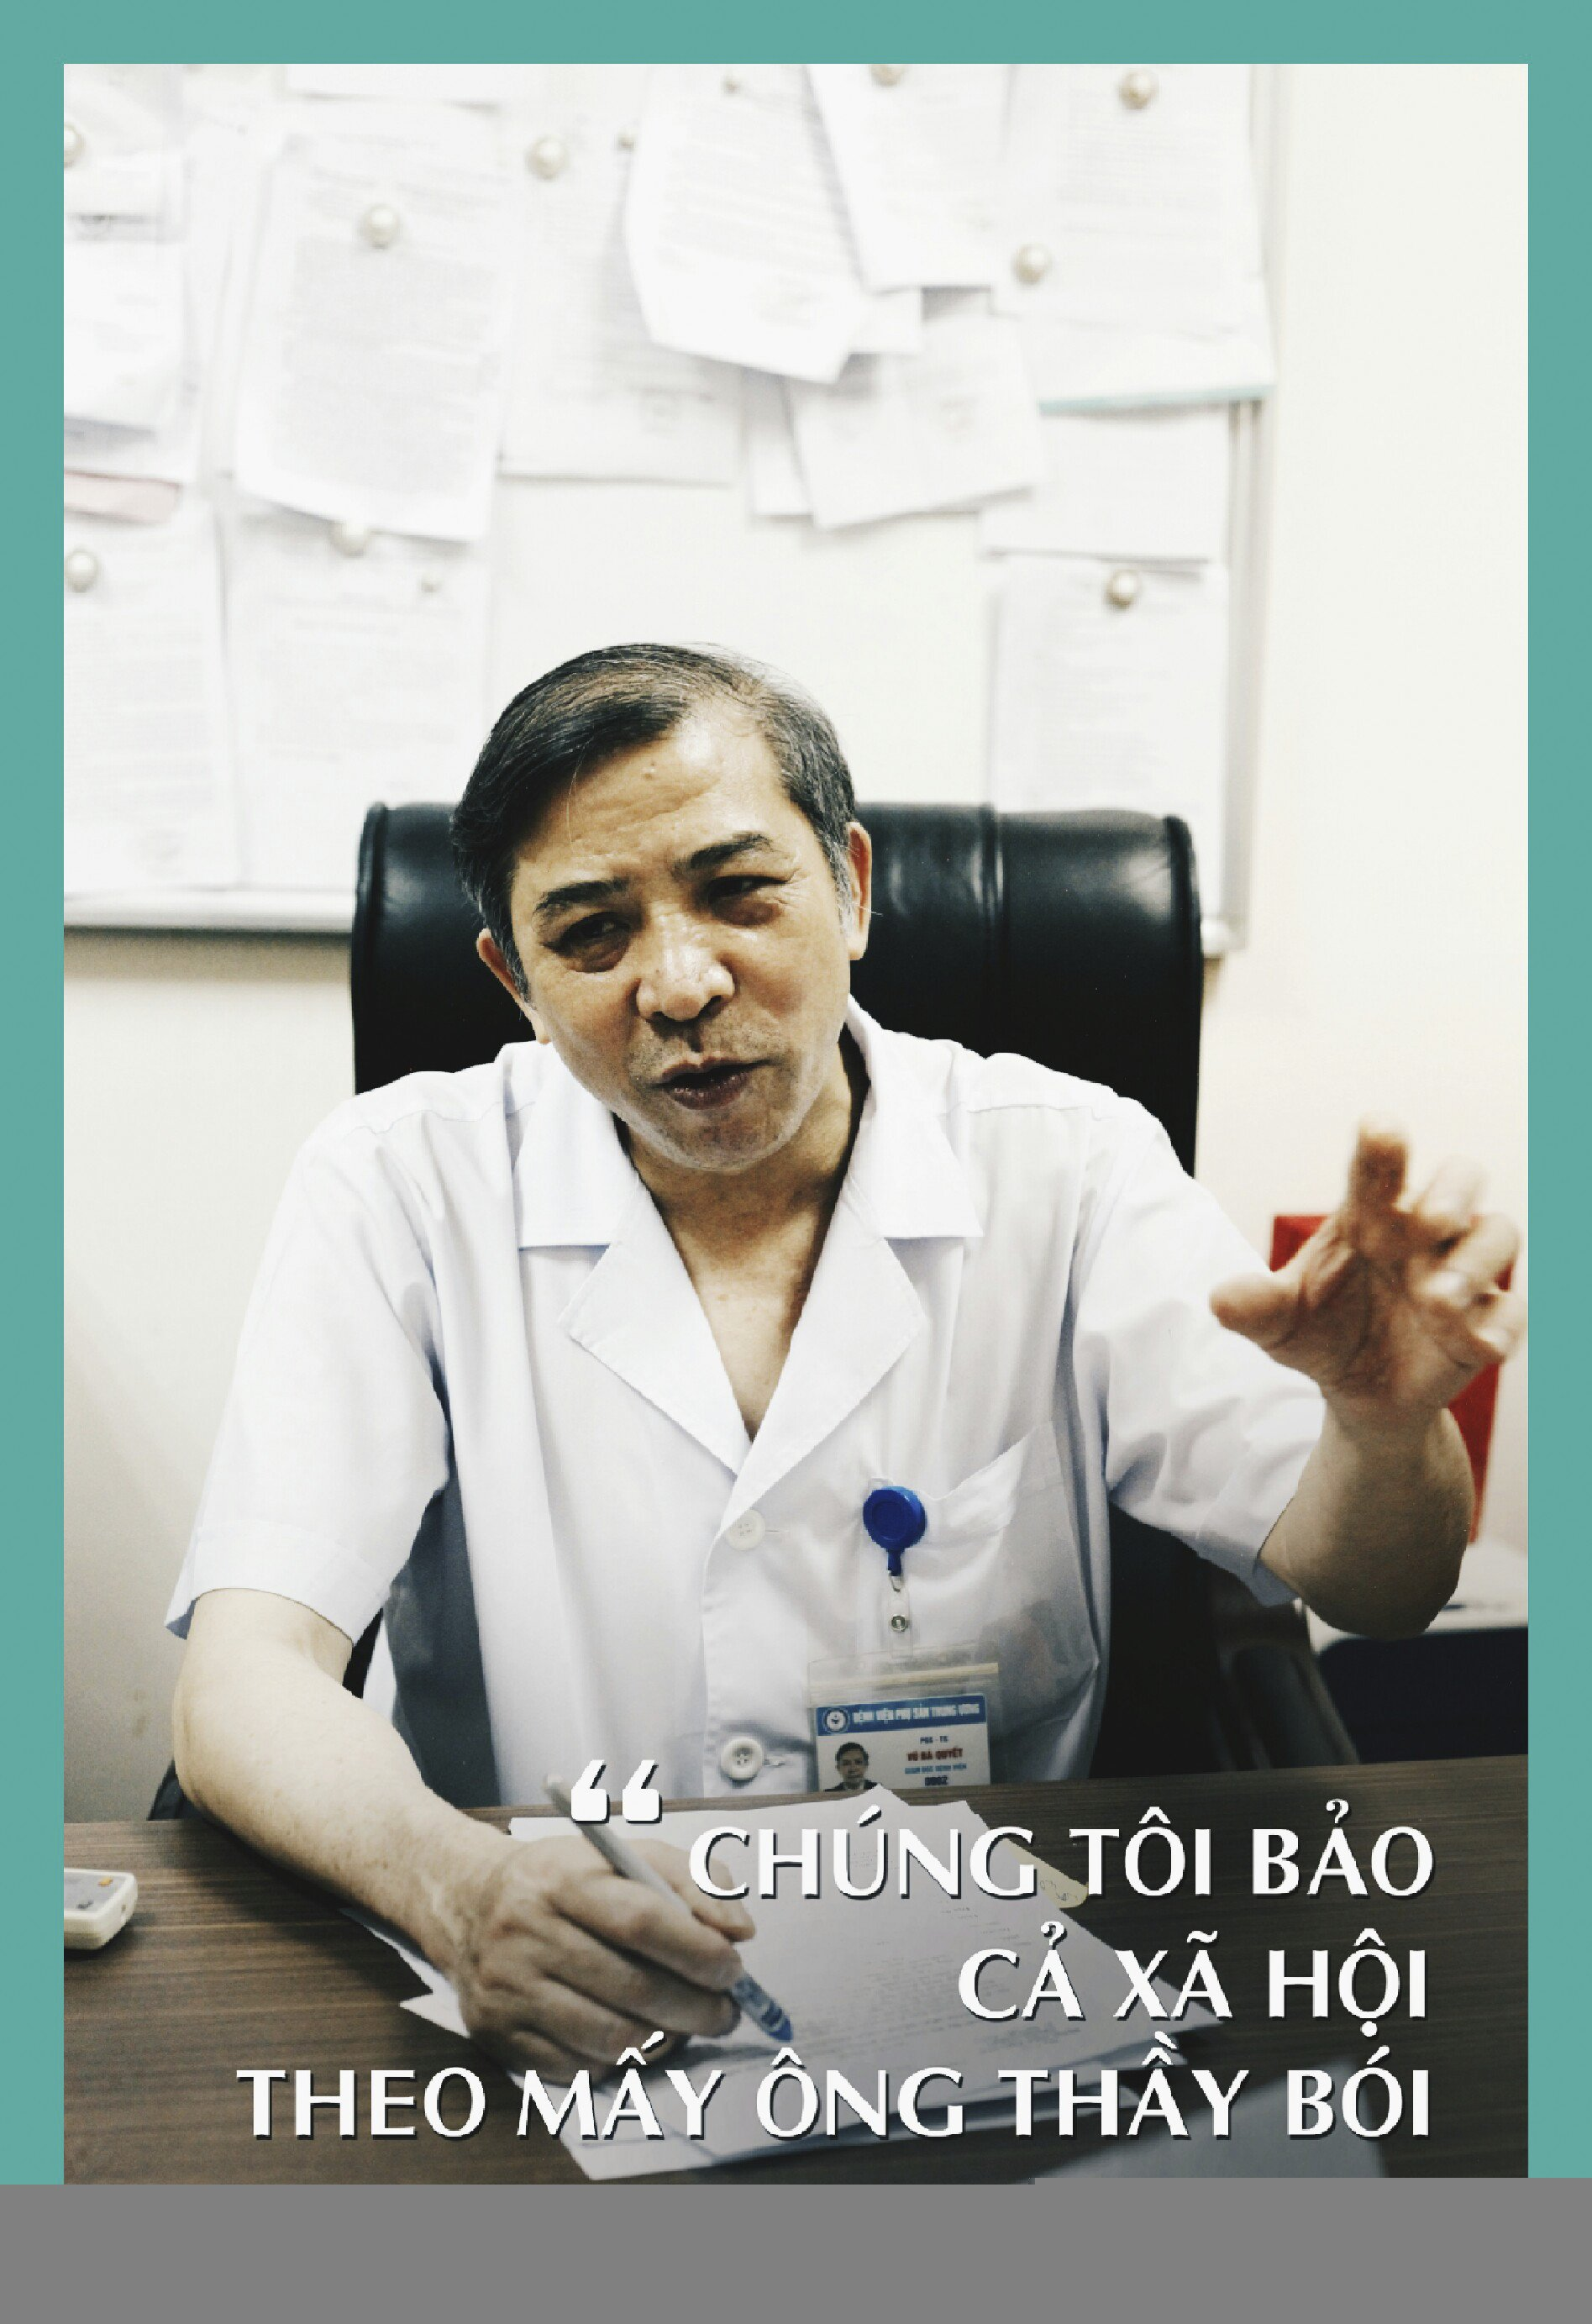 Giam doc Benh vien Phu san Trung uong bat mi hang loat chuyen 'lam dep cho phu nu' hinh anh 2